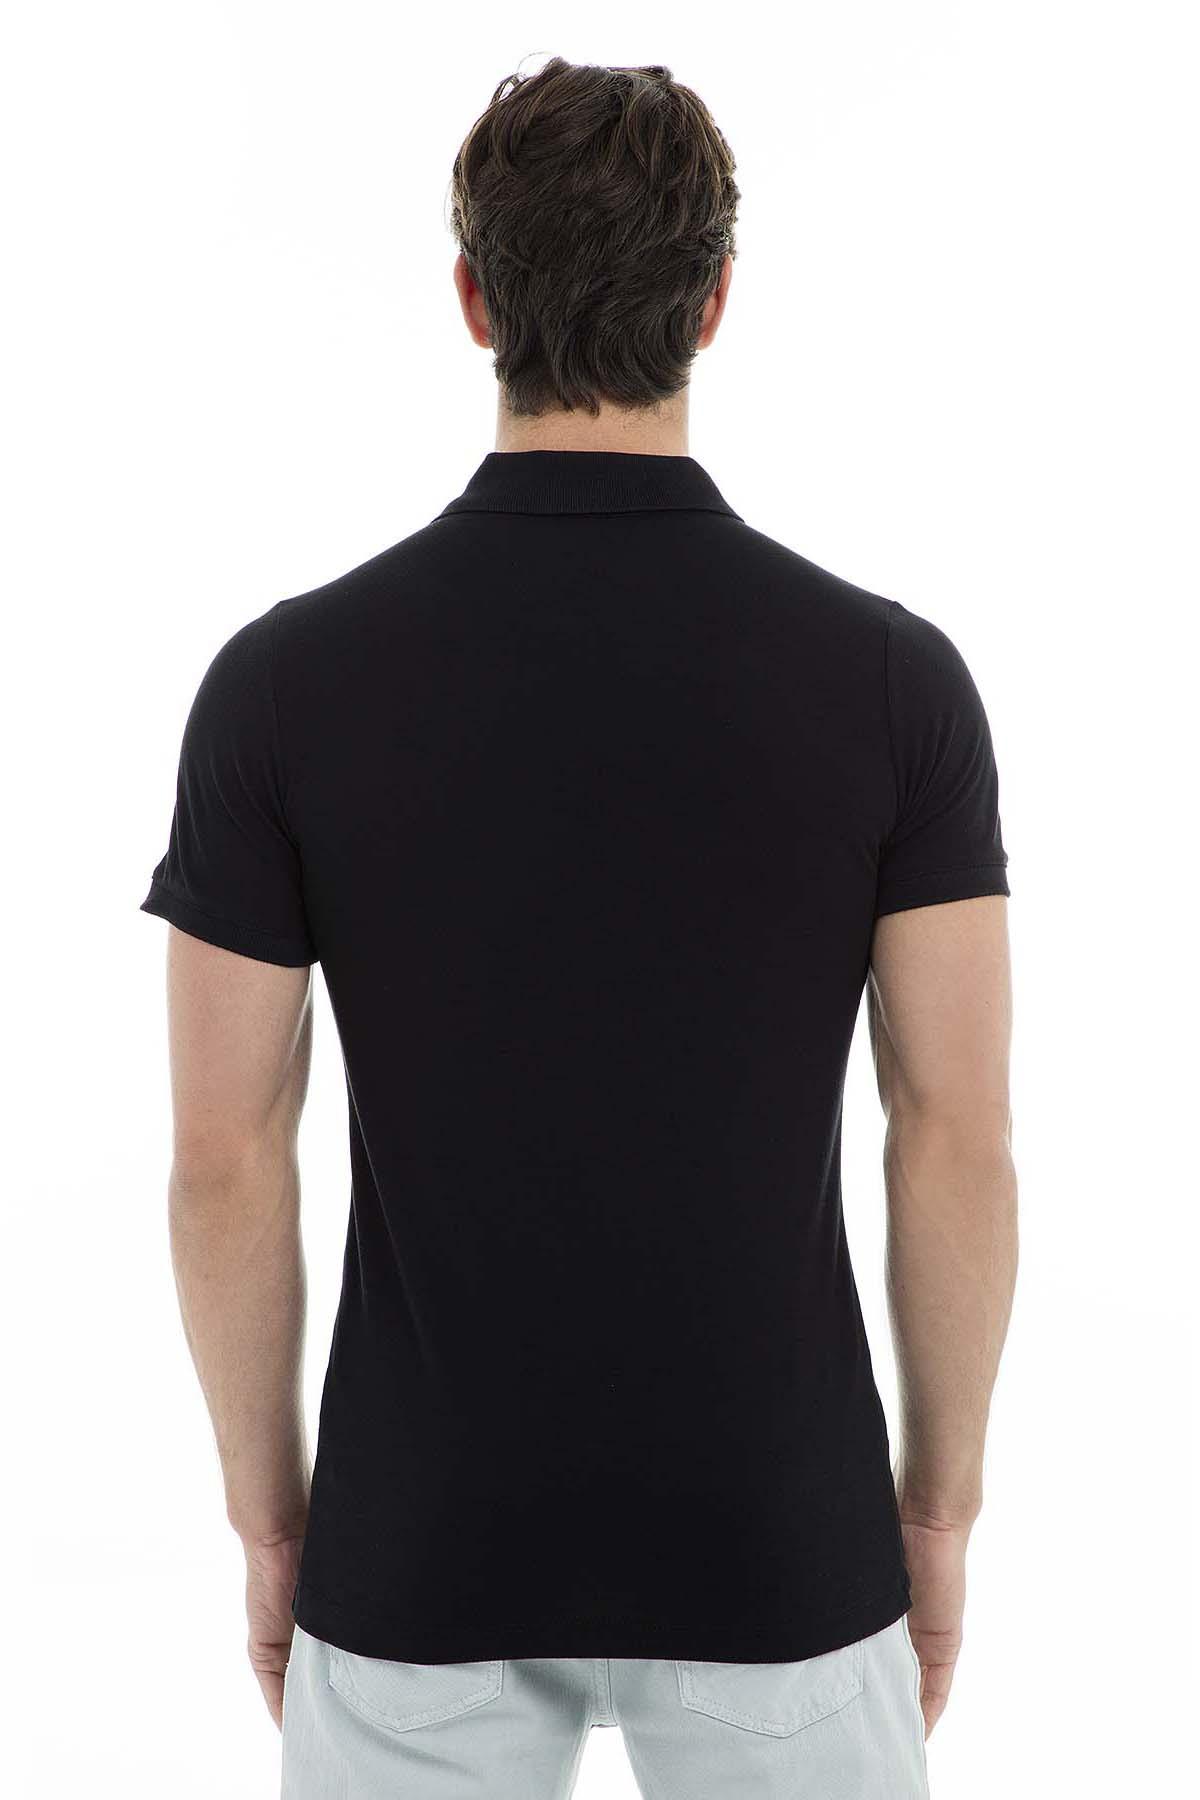 Buratti Polo T shirt Tees Polos Giyim Erkek Tees Polos Erkek Giyim shrt 43619090 mens shrt 43619090 Buratti Polo T gömlek mens